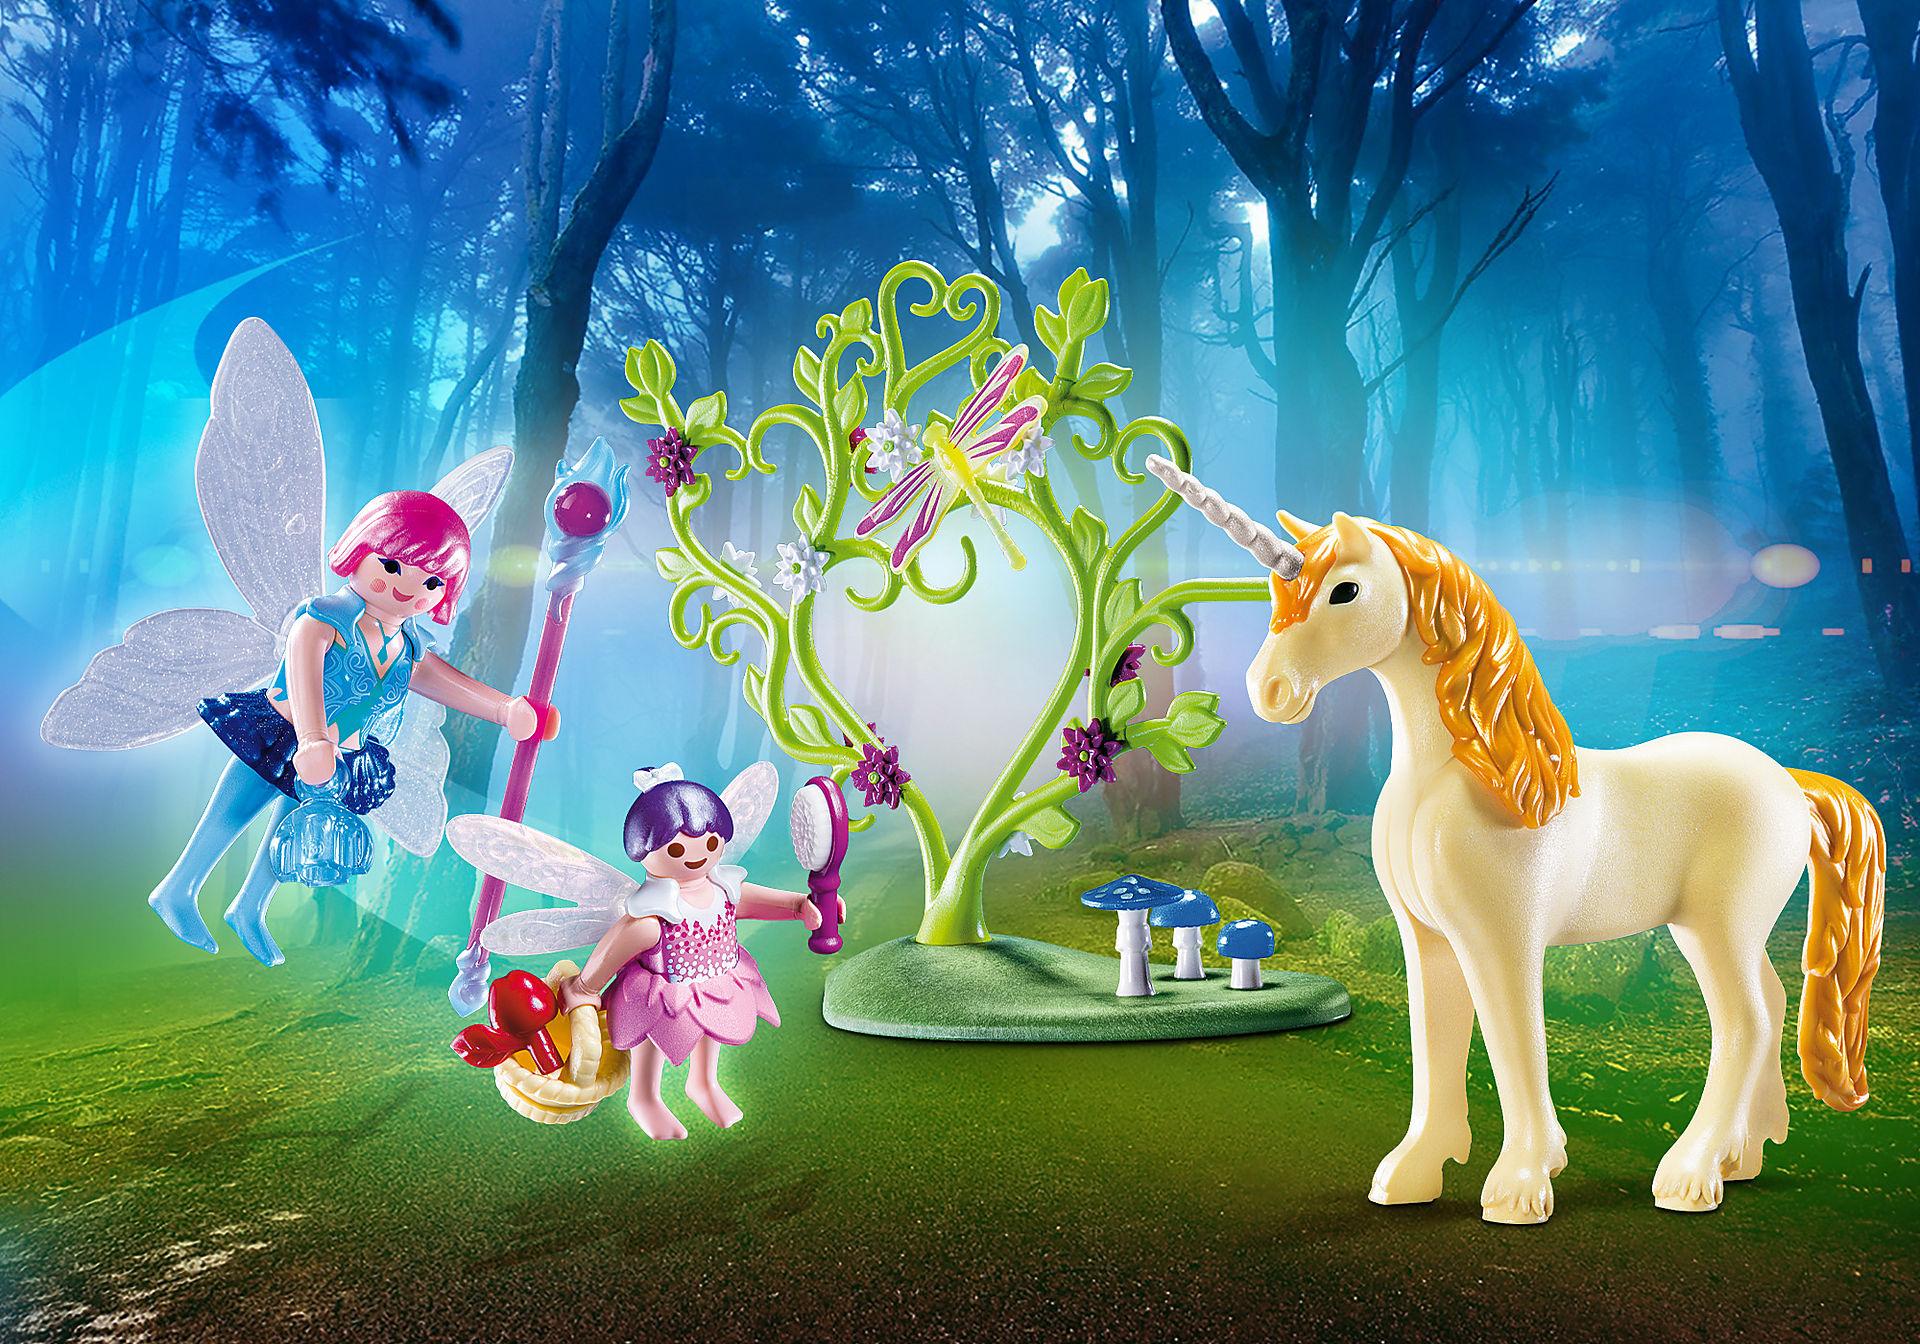 70529 Fairy Unicorn Carry Case zoom image1